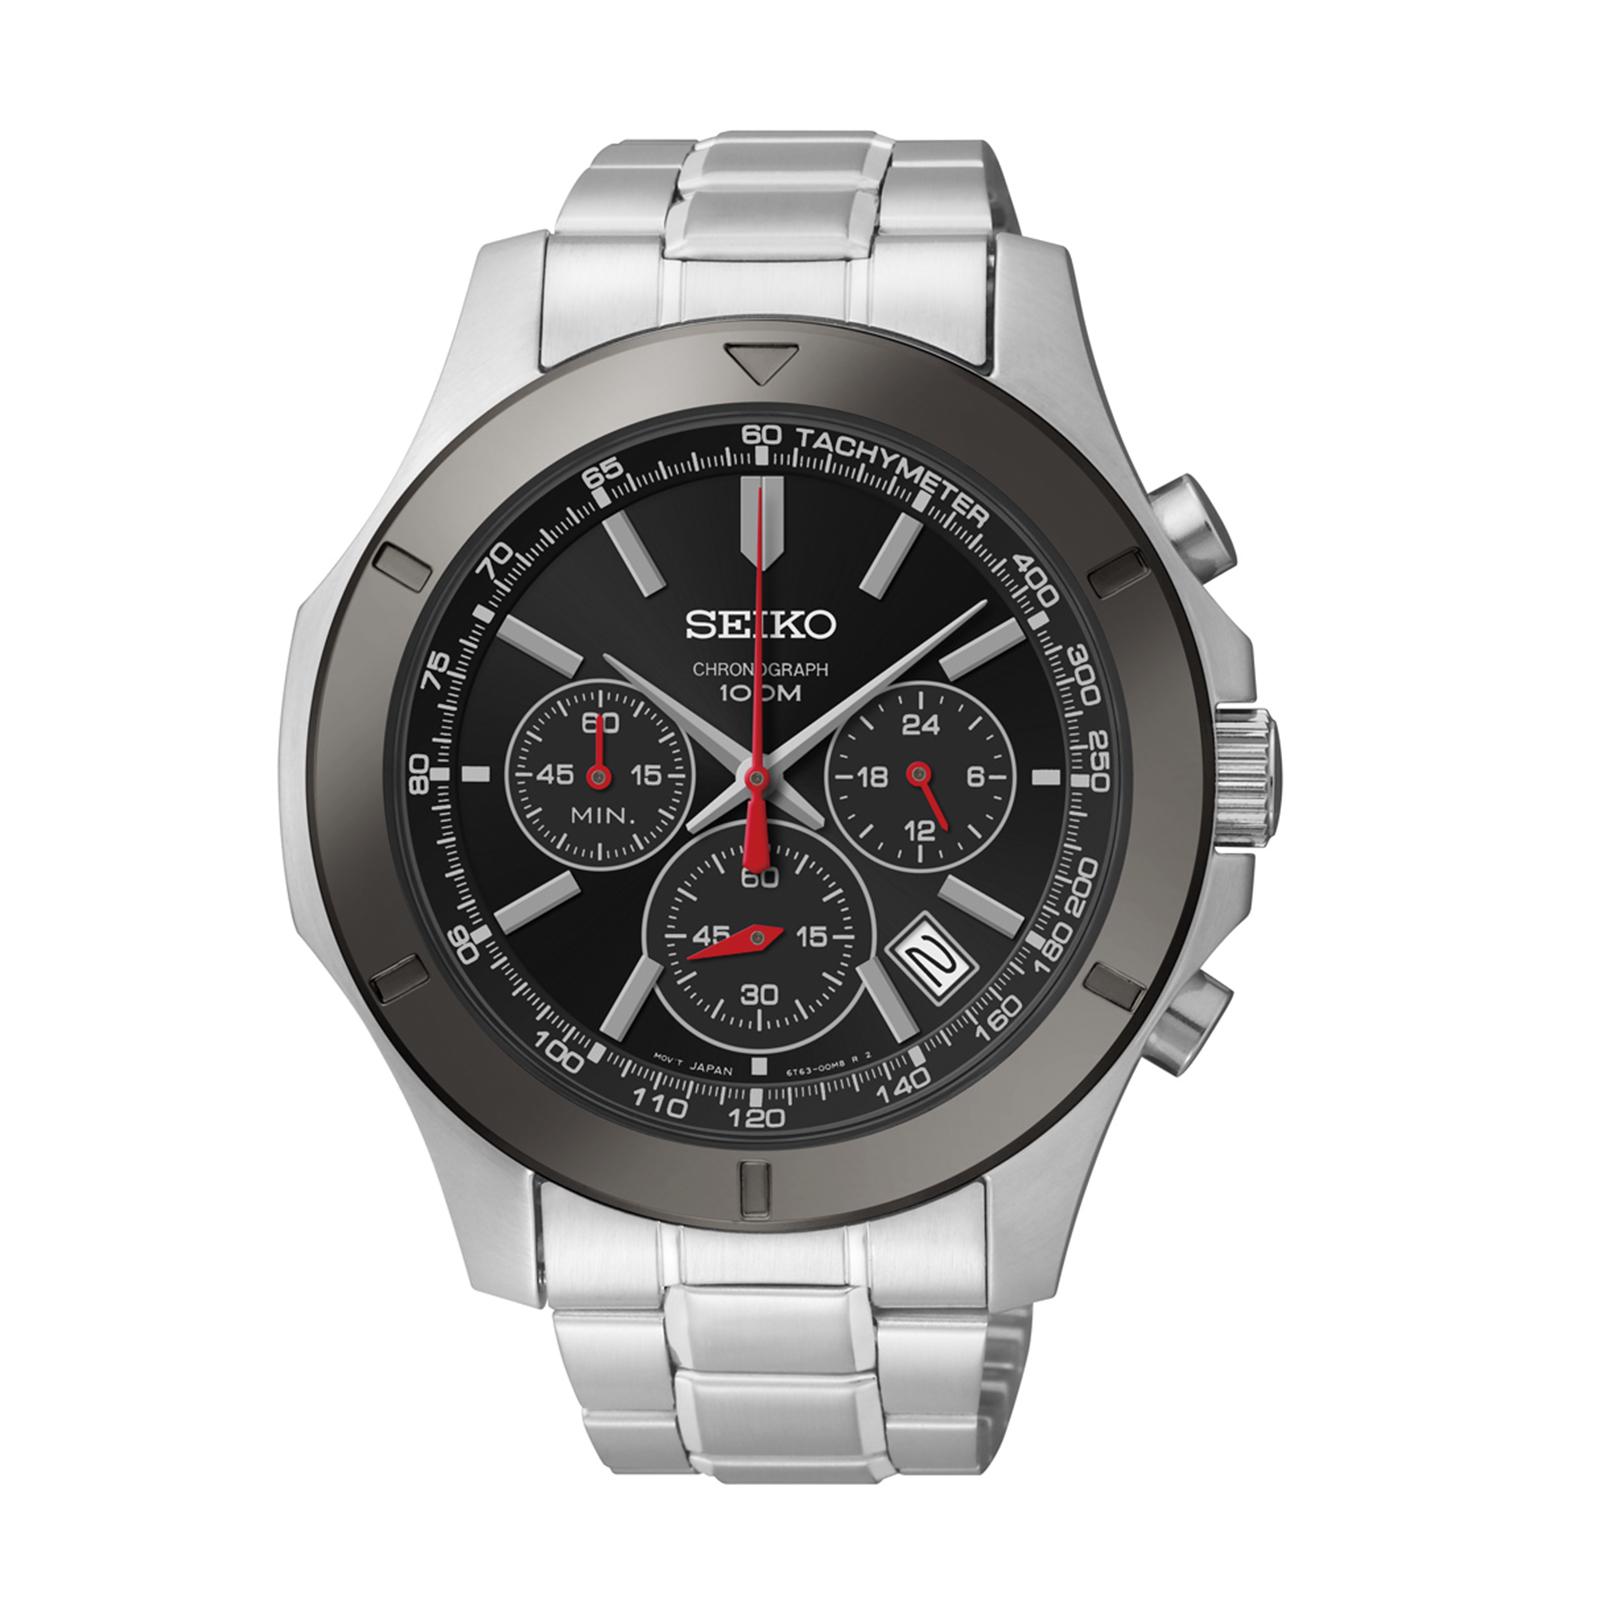 Seiko Men's Stainless Steel Chronograph Watch